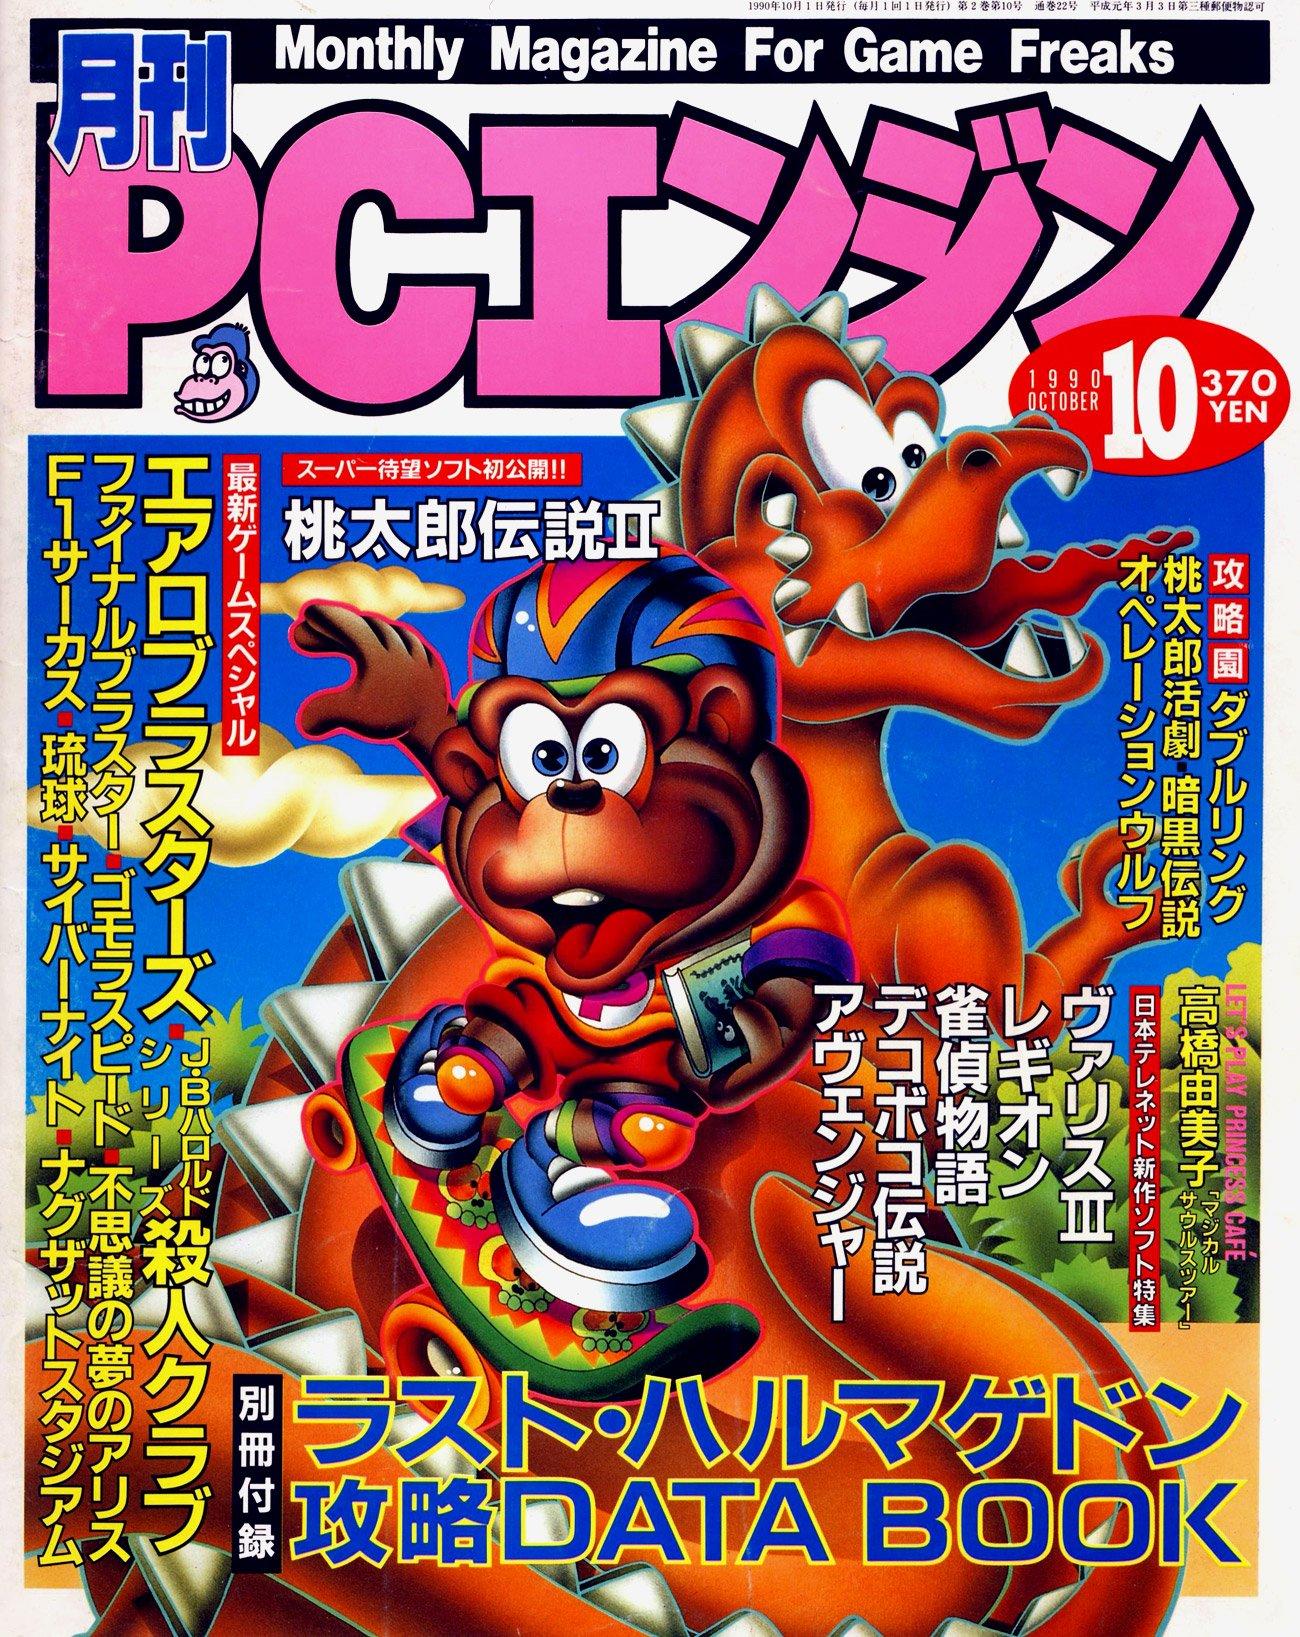 Gekkan PC Engine Issue 22 (October 1990)